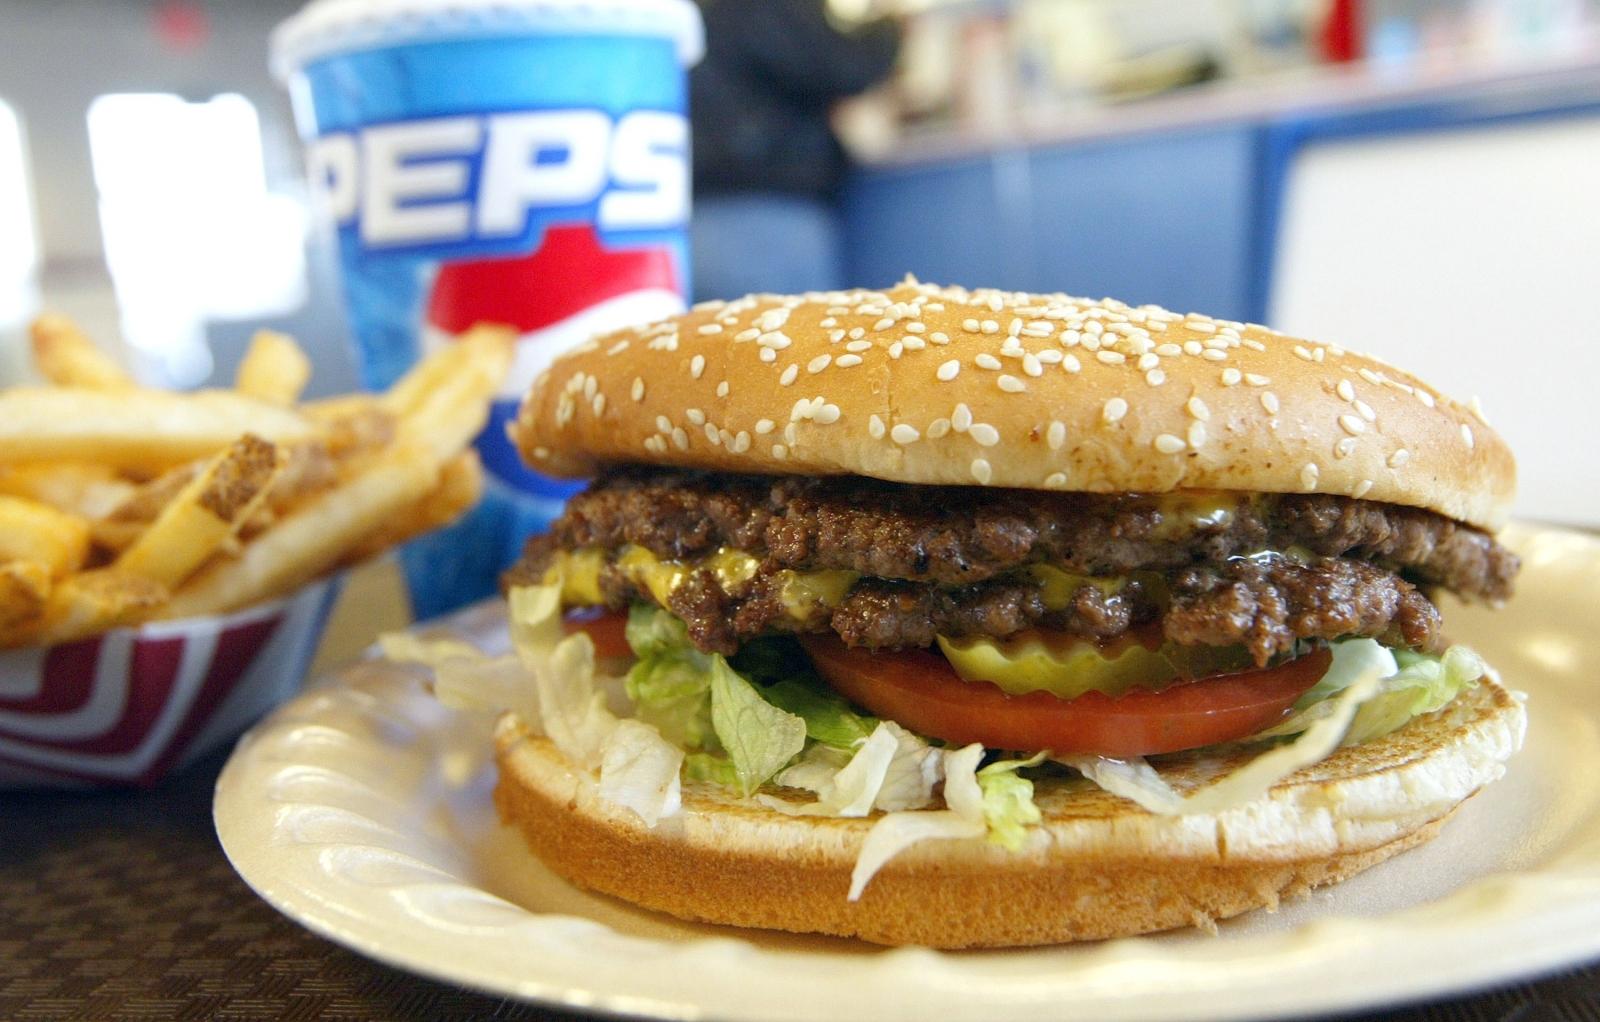 A fast food burger